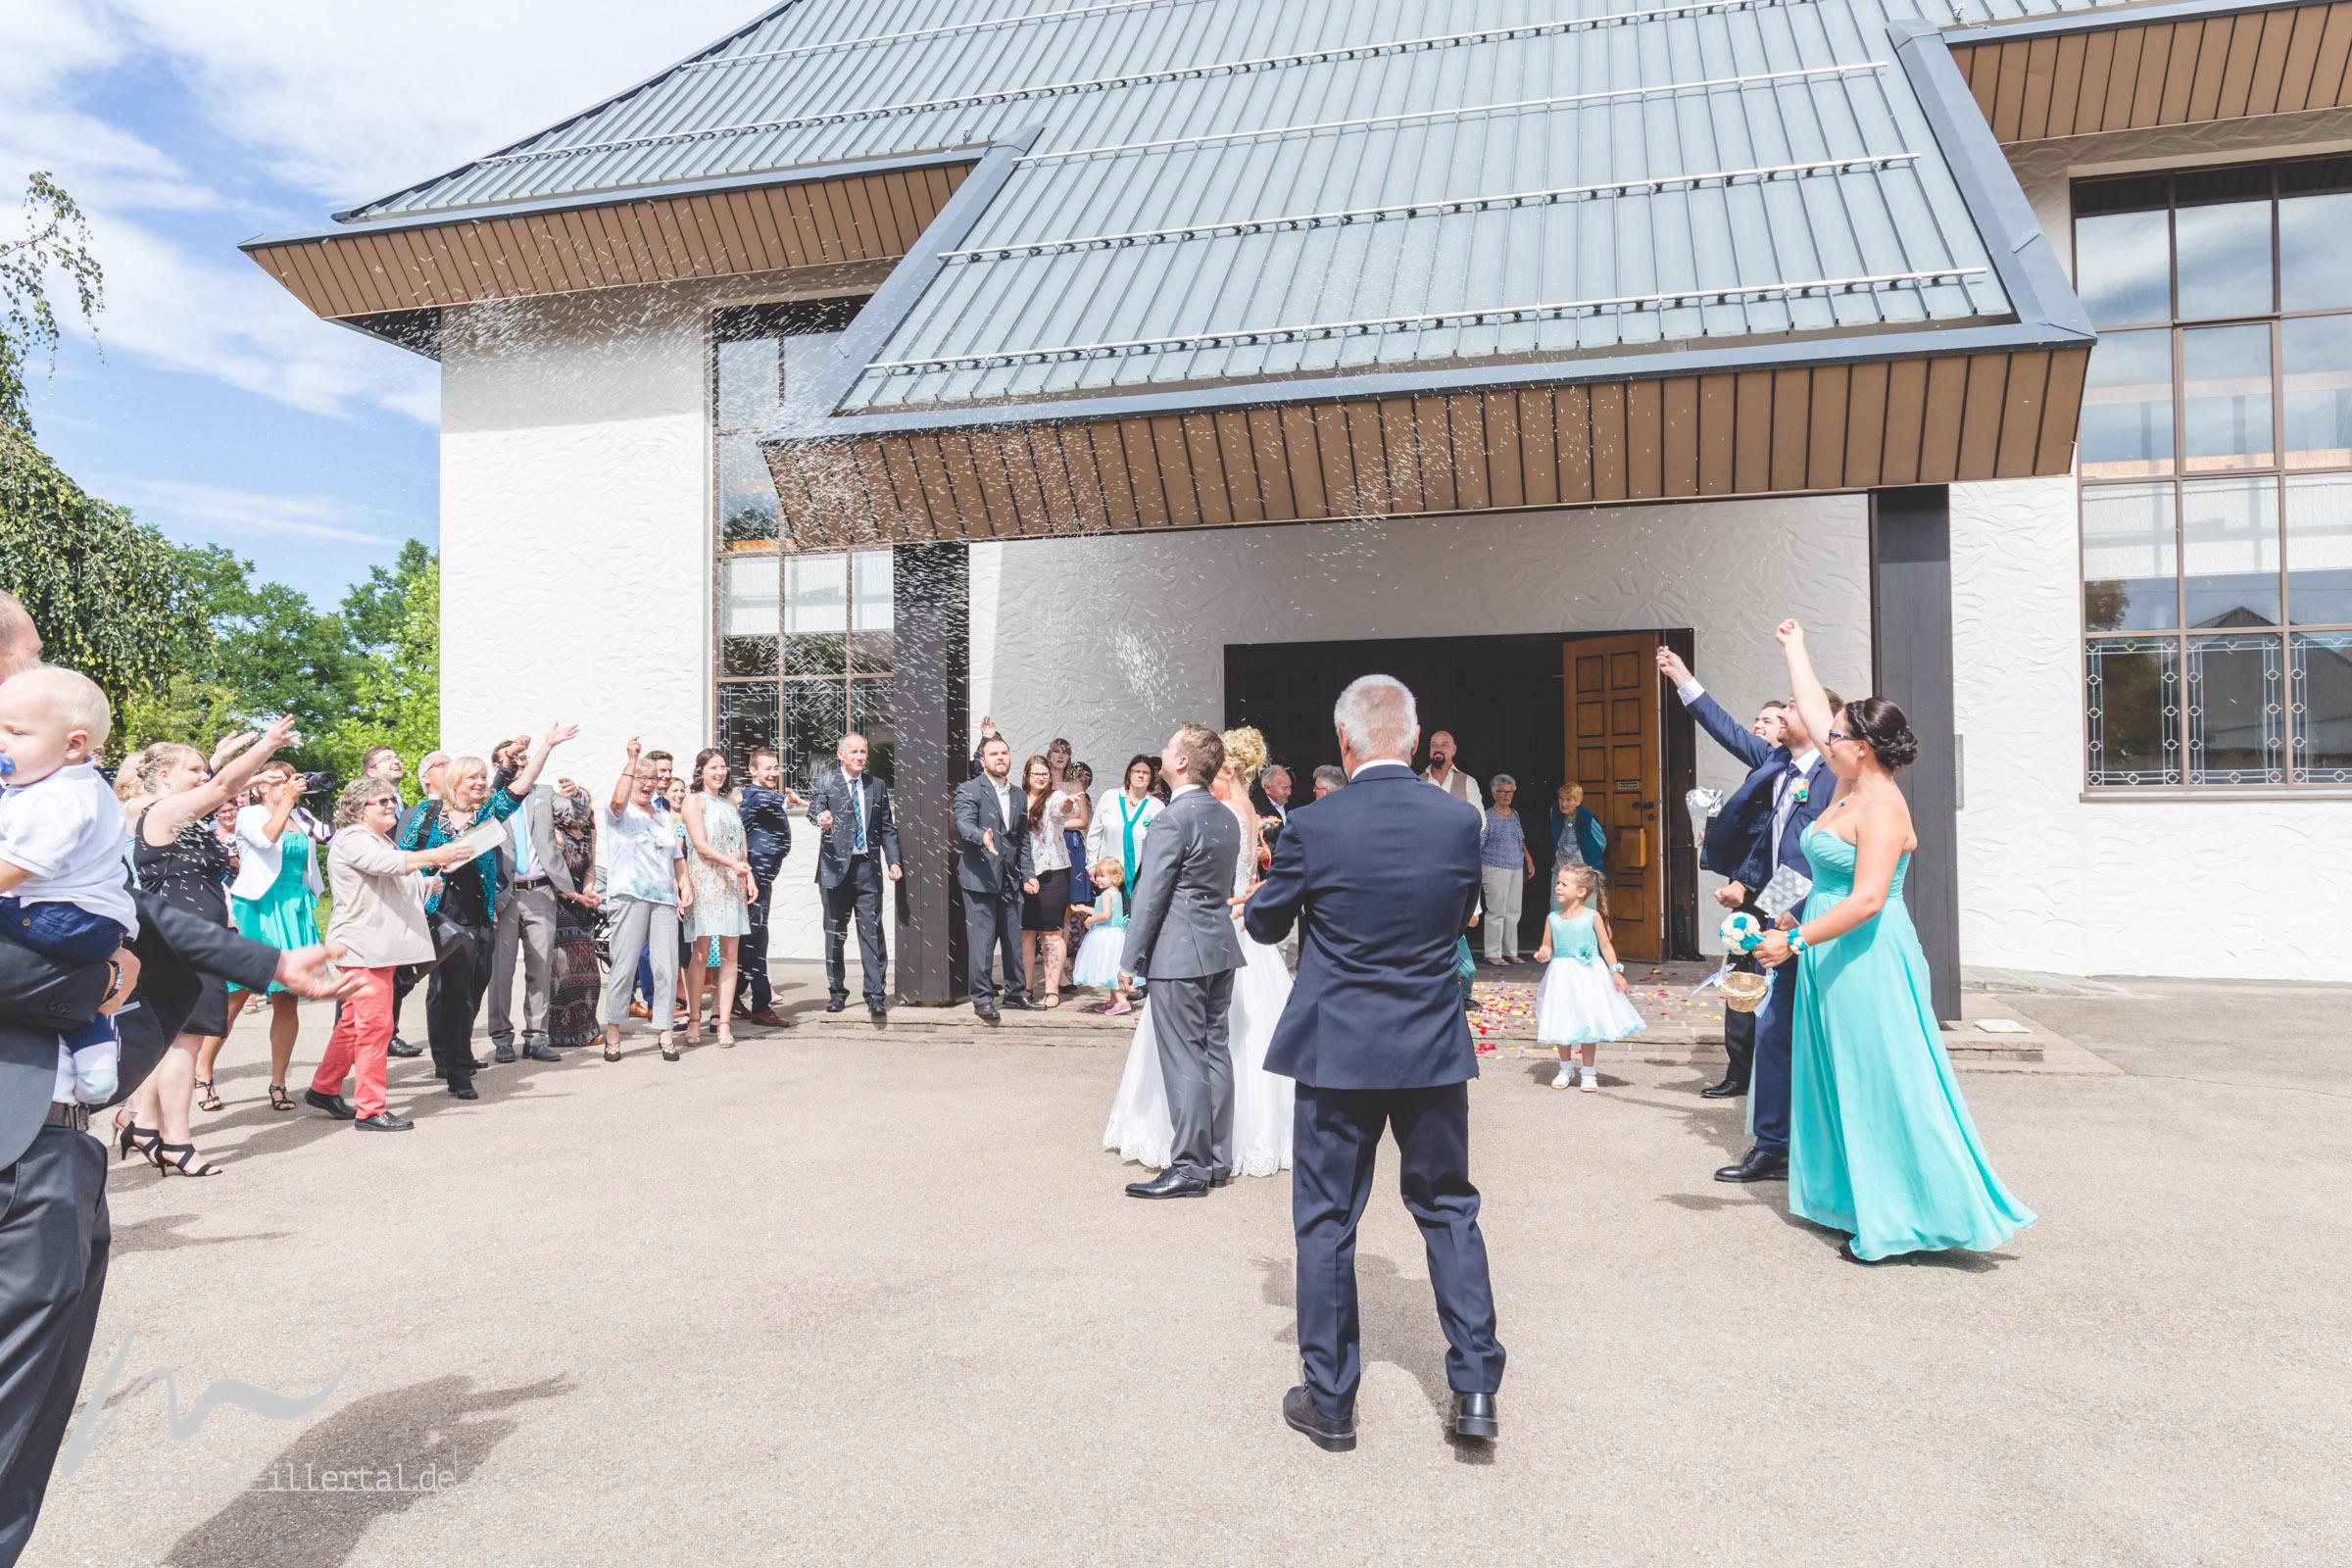 Fotograf Illertal-Christian Miller-Hochzeitsfotografie-_MG_6004